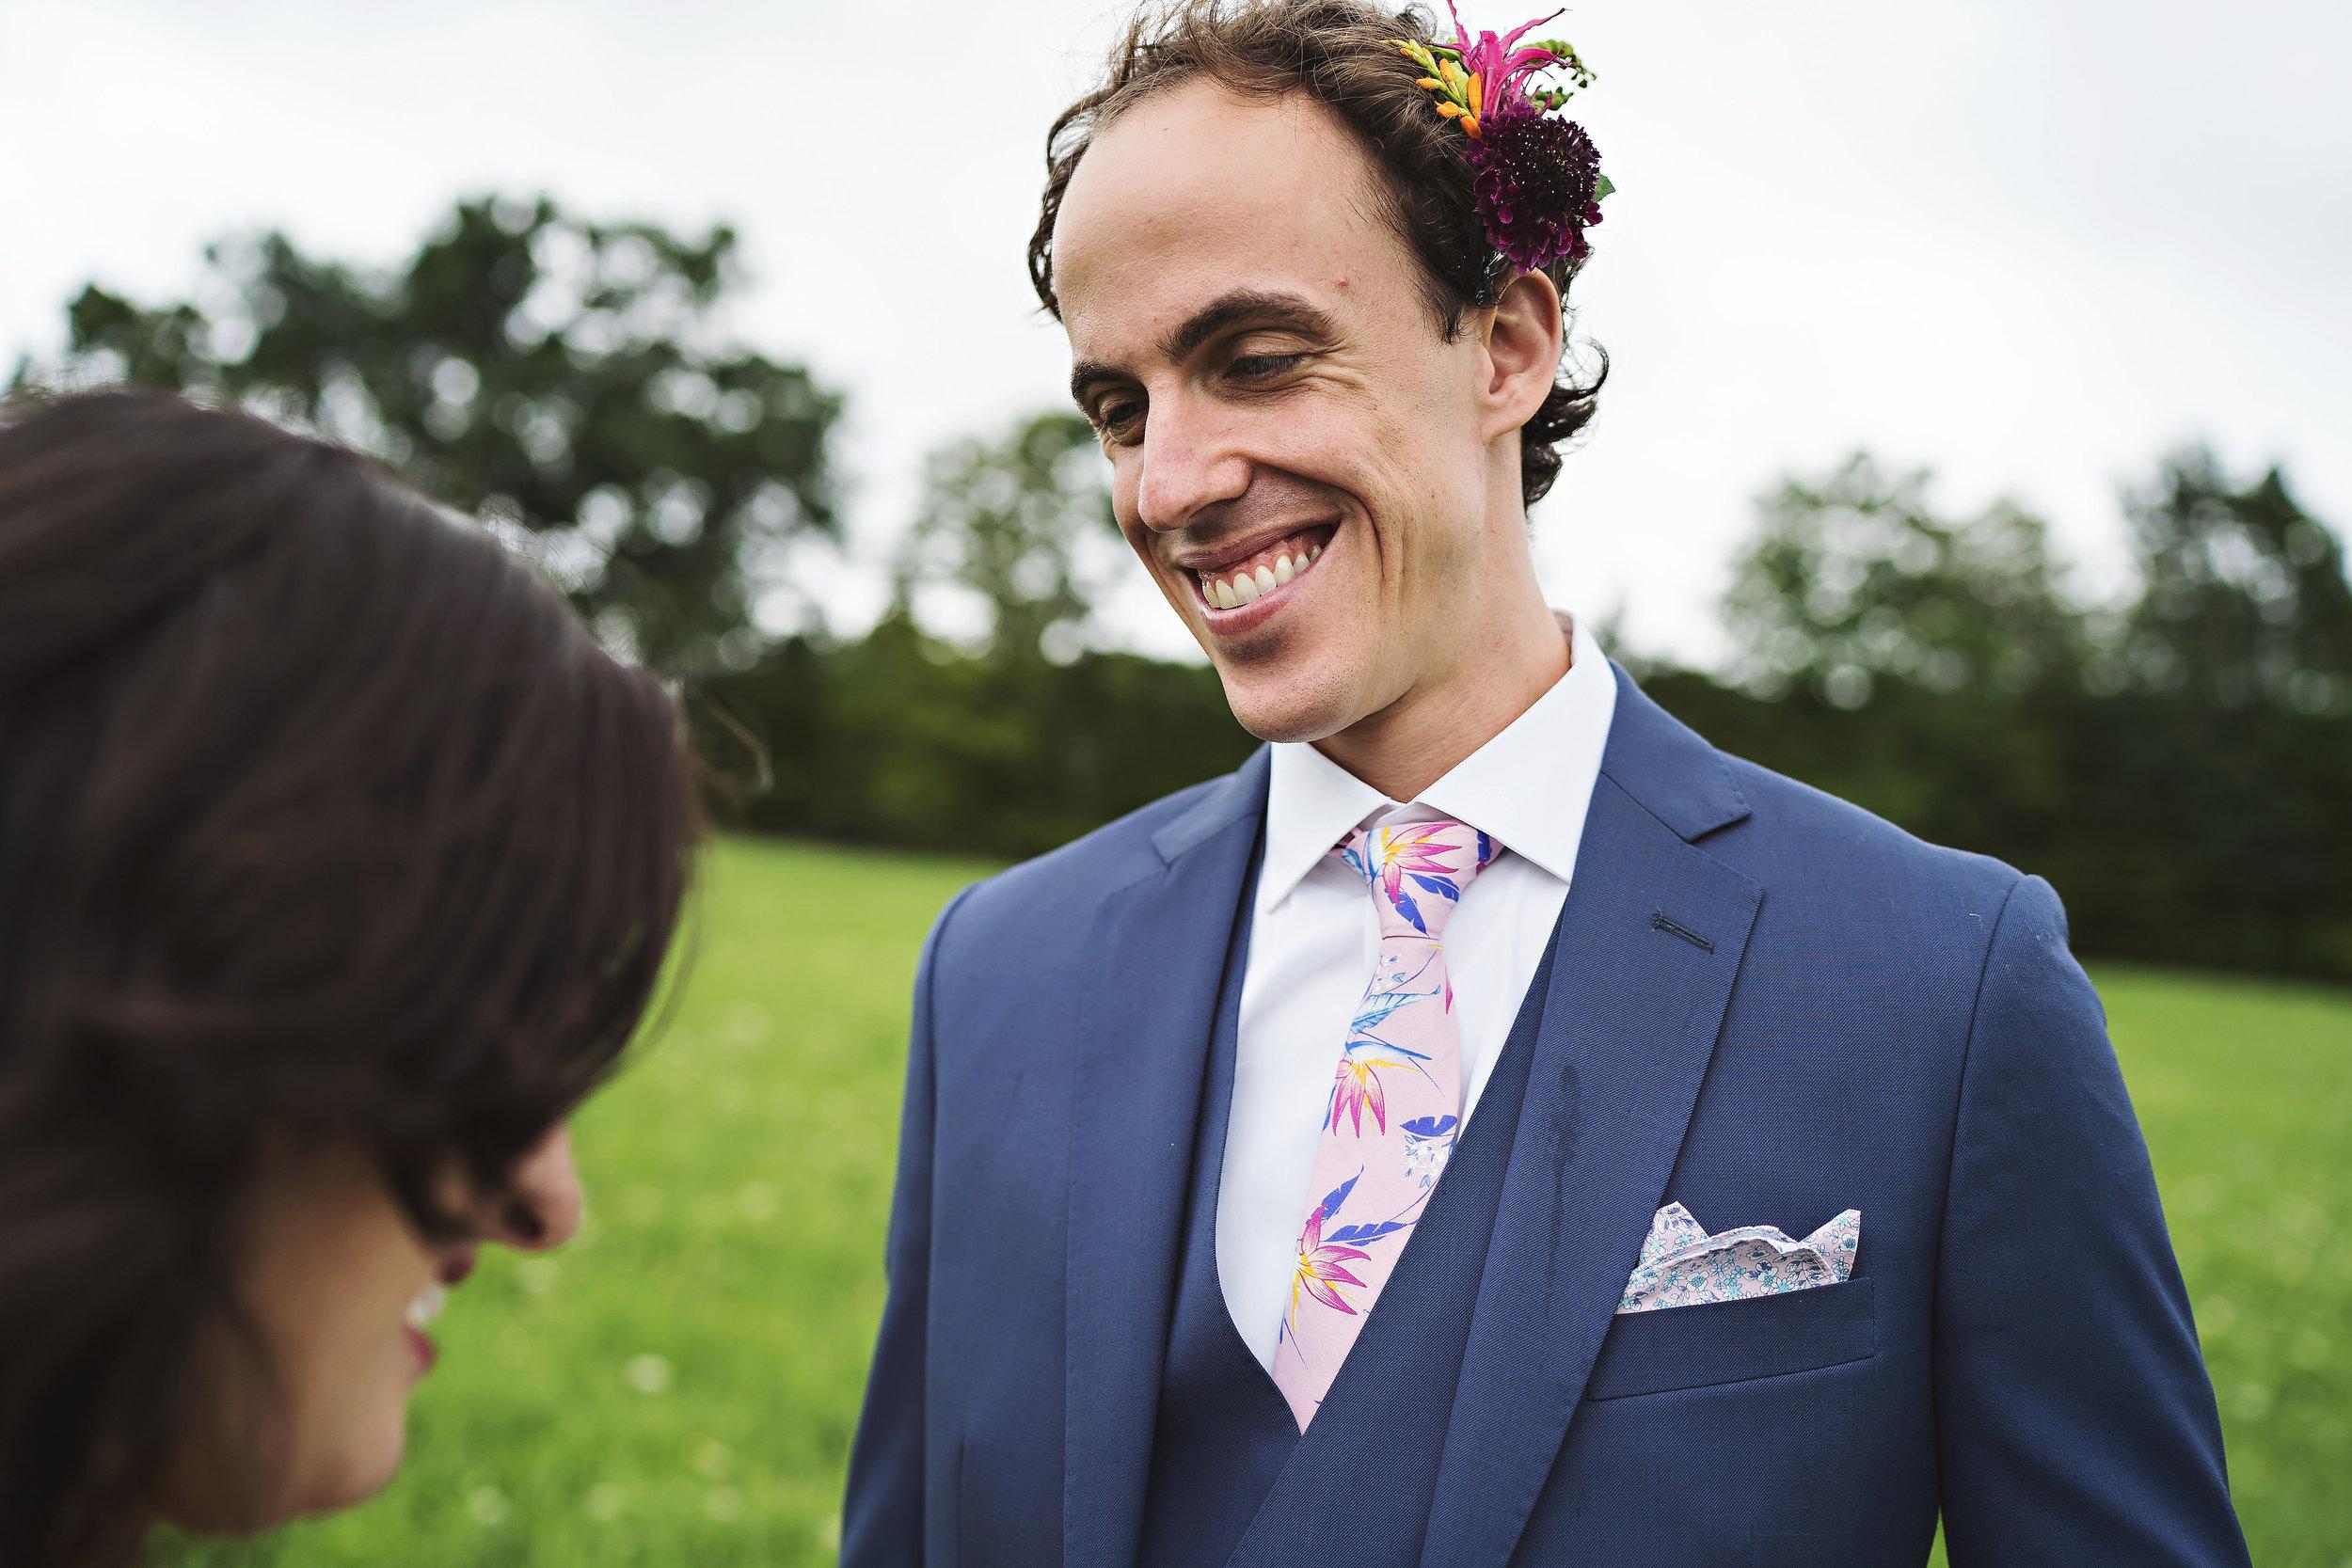 upstate-ny-wedding-jove-meyer-events-inbal-sivan-075.jpg